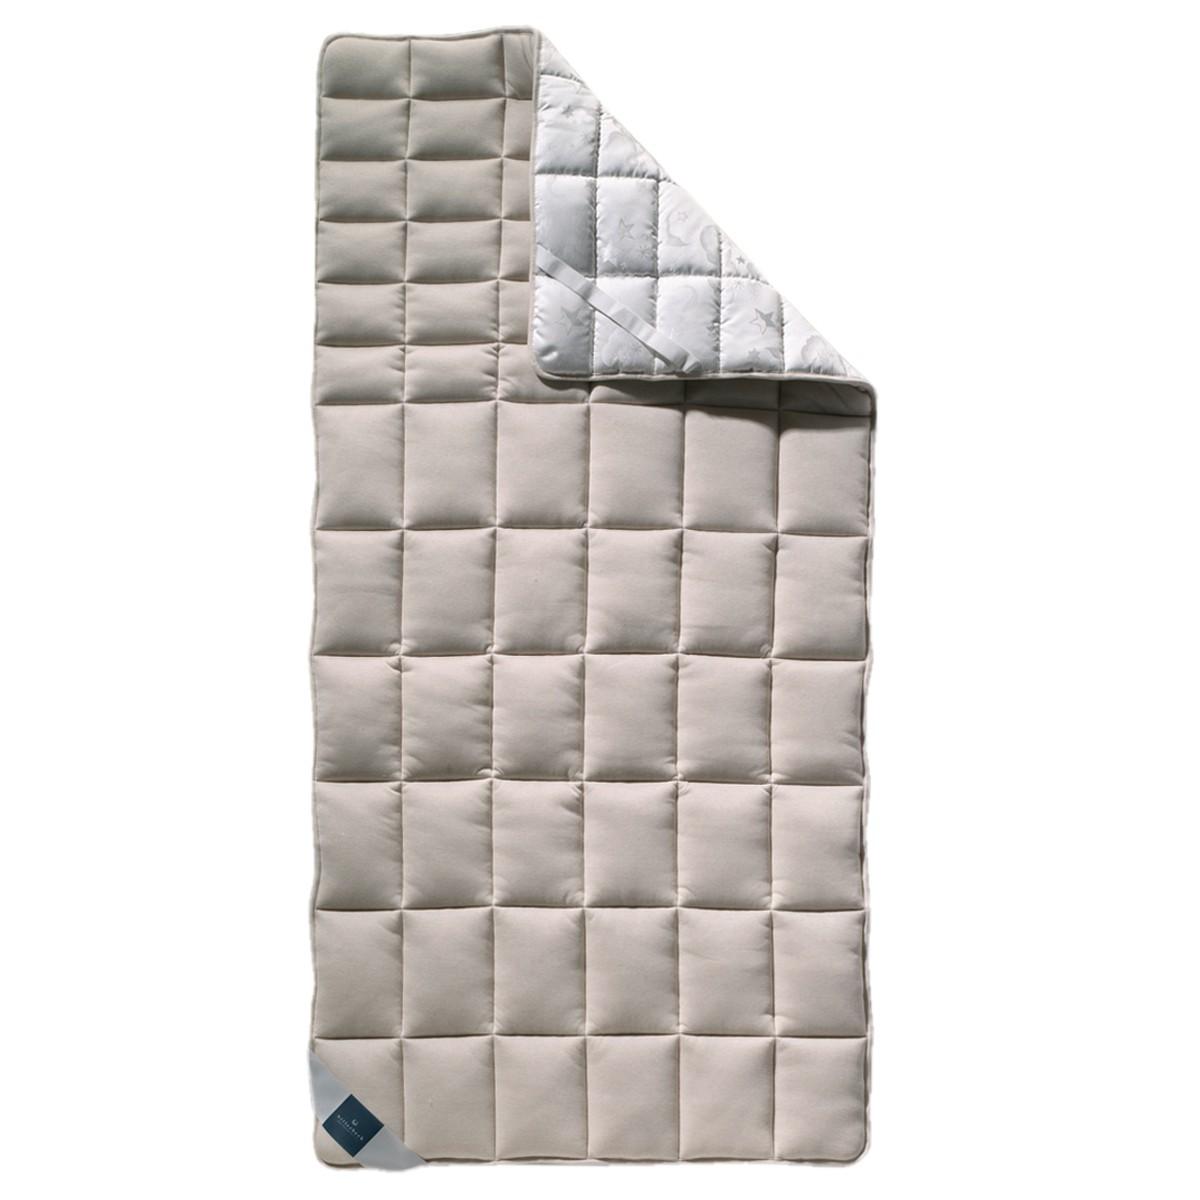 schurwollunterbett billerbeck classic natur 744 supra. Black Bedroom Furniture Sets. Home Design Ideas